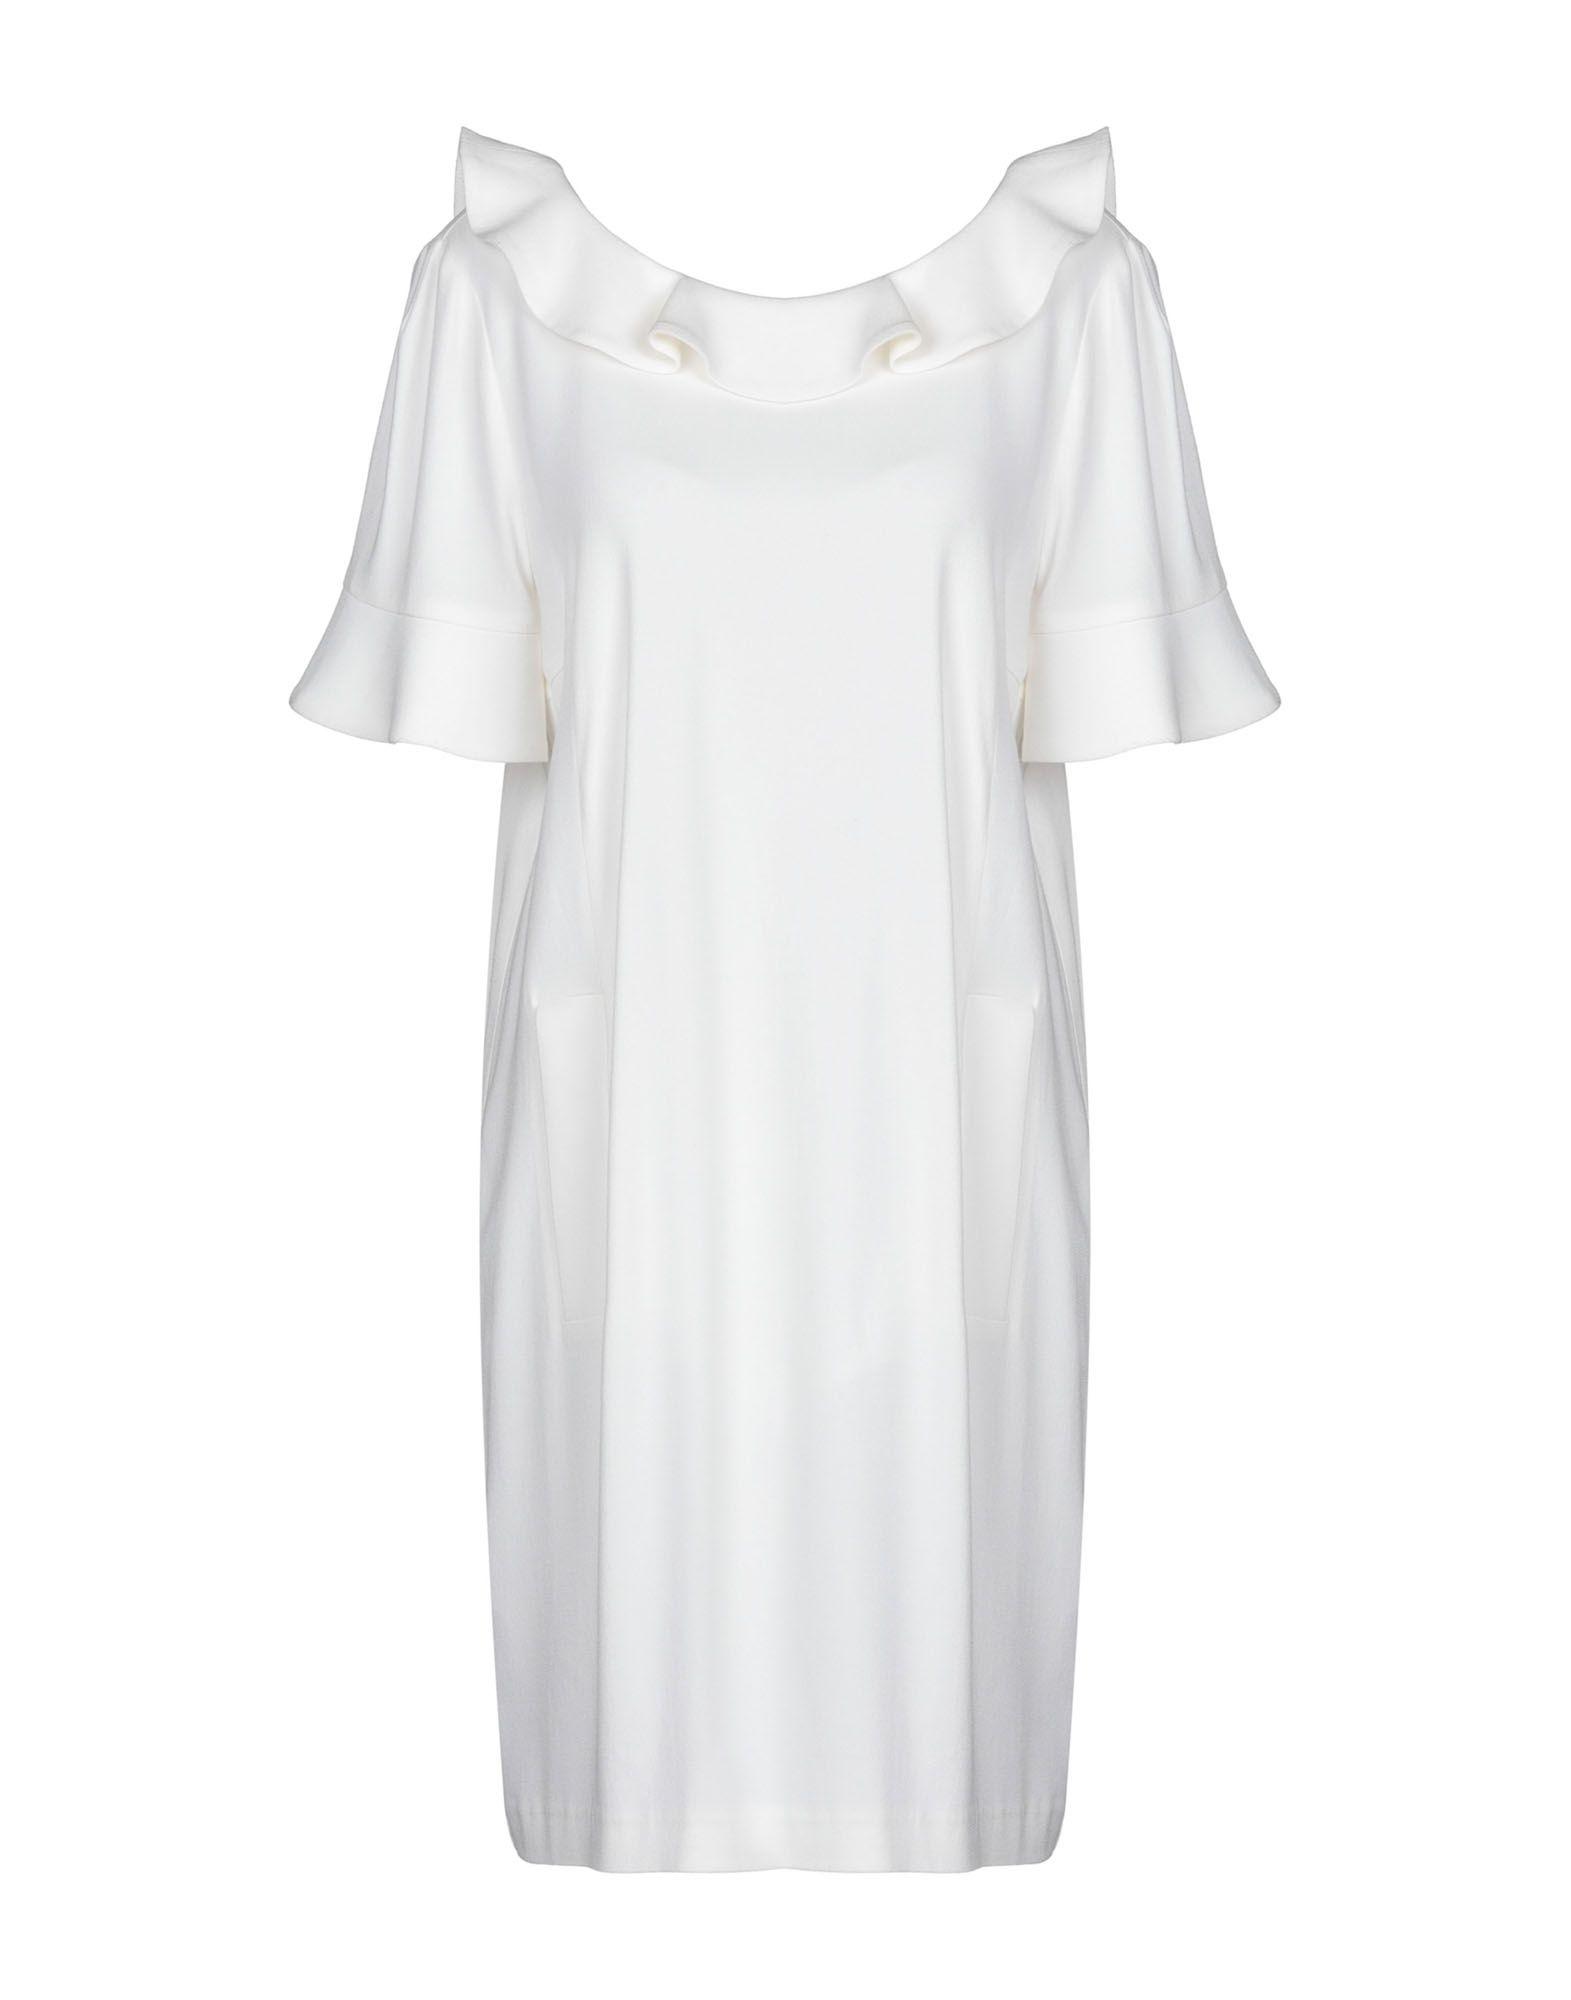 TWIN-SET Simona Barbieri Короткое платье платье